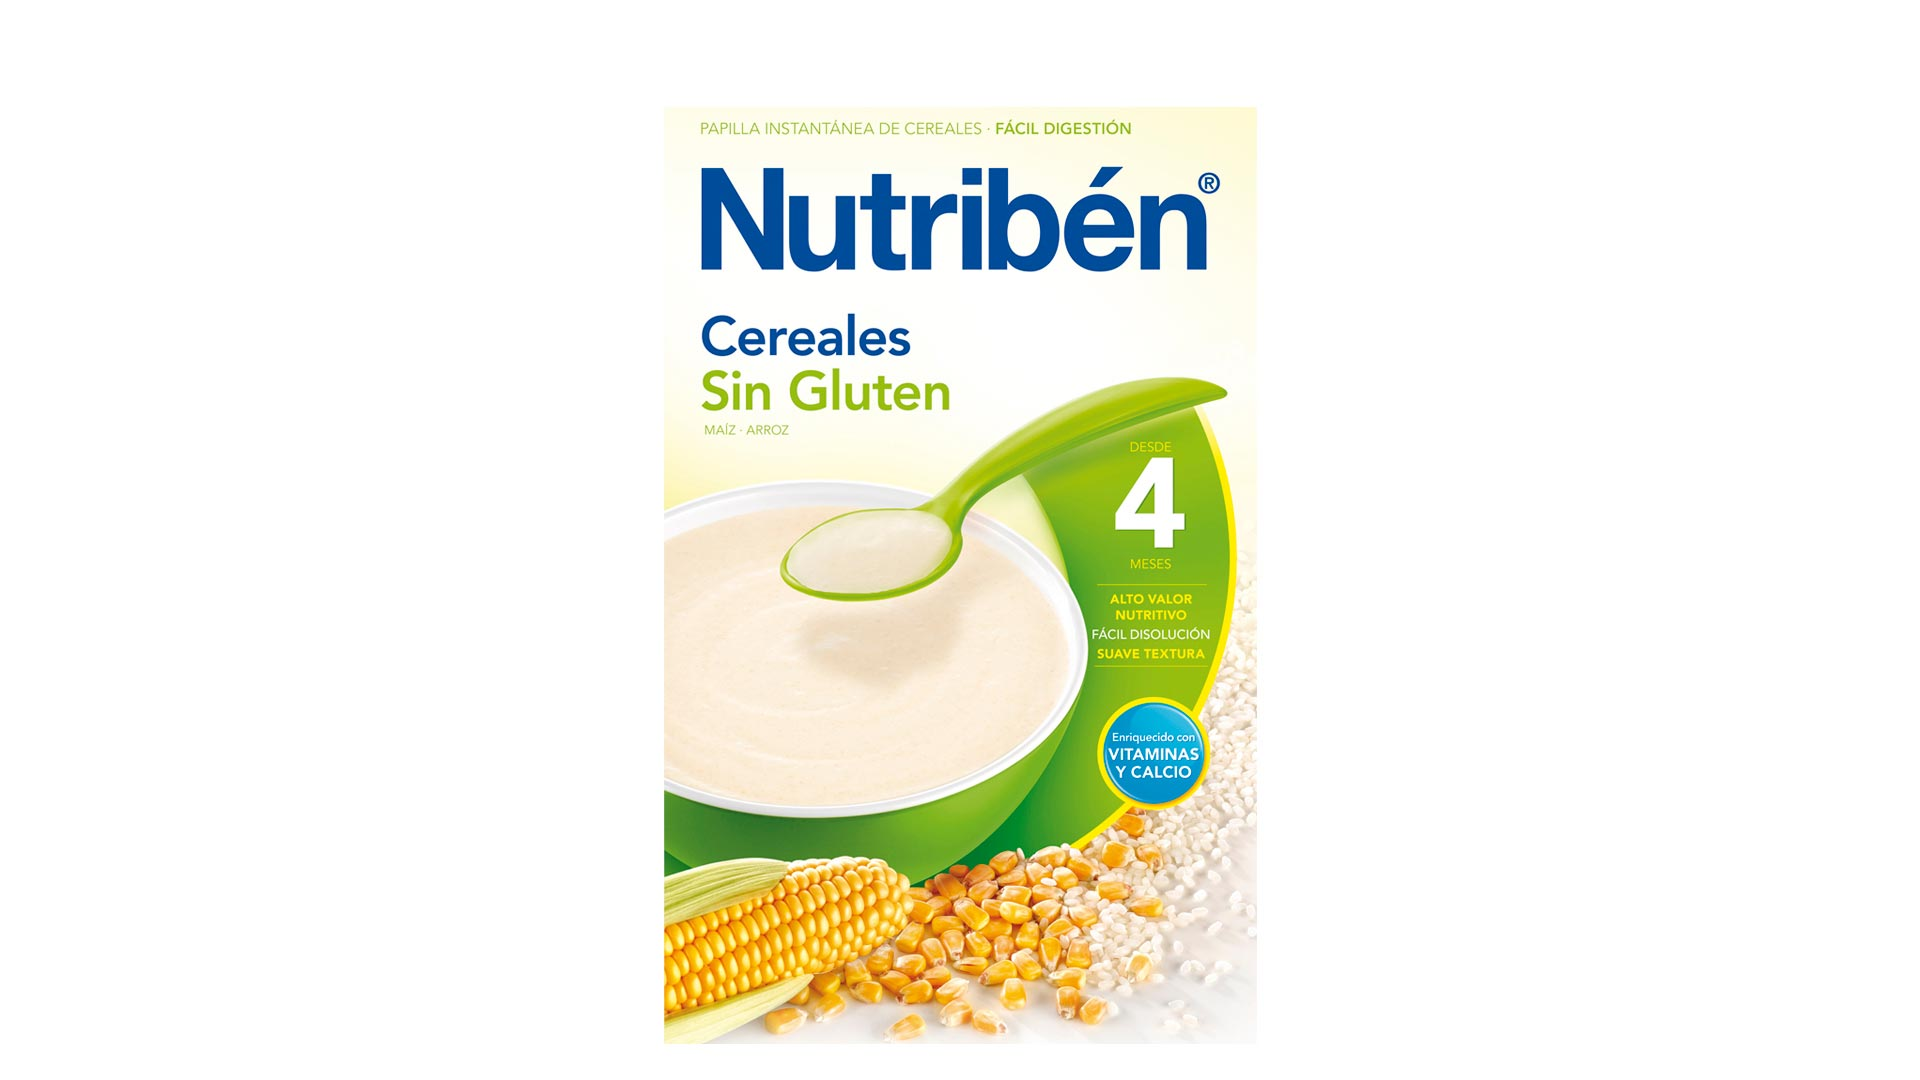 pk_f3p2a-nutriben-01